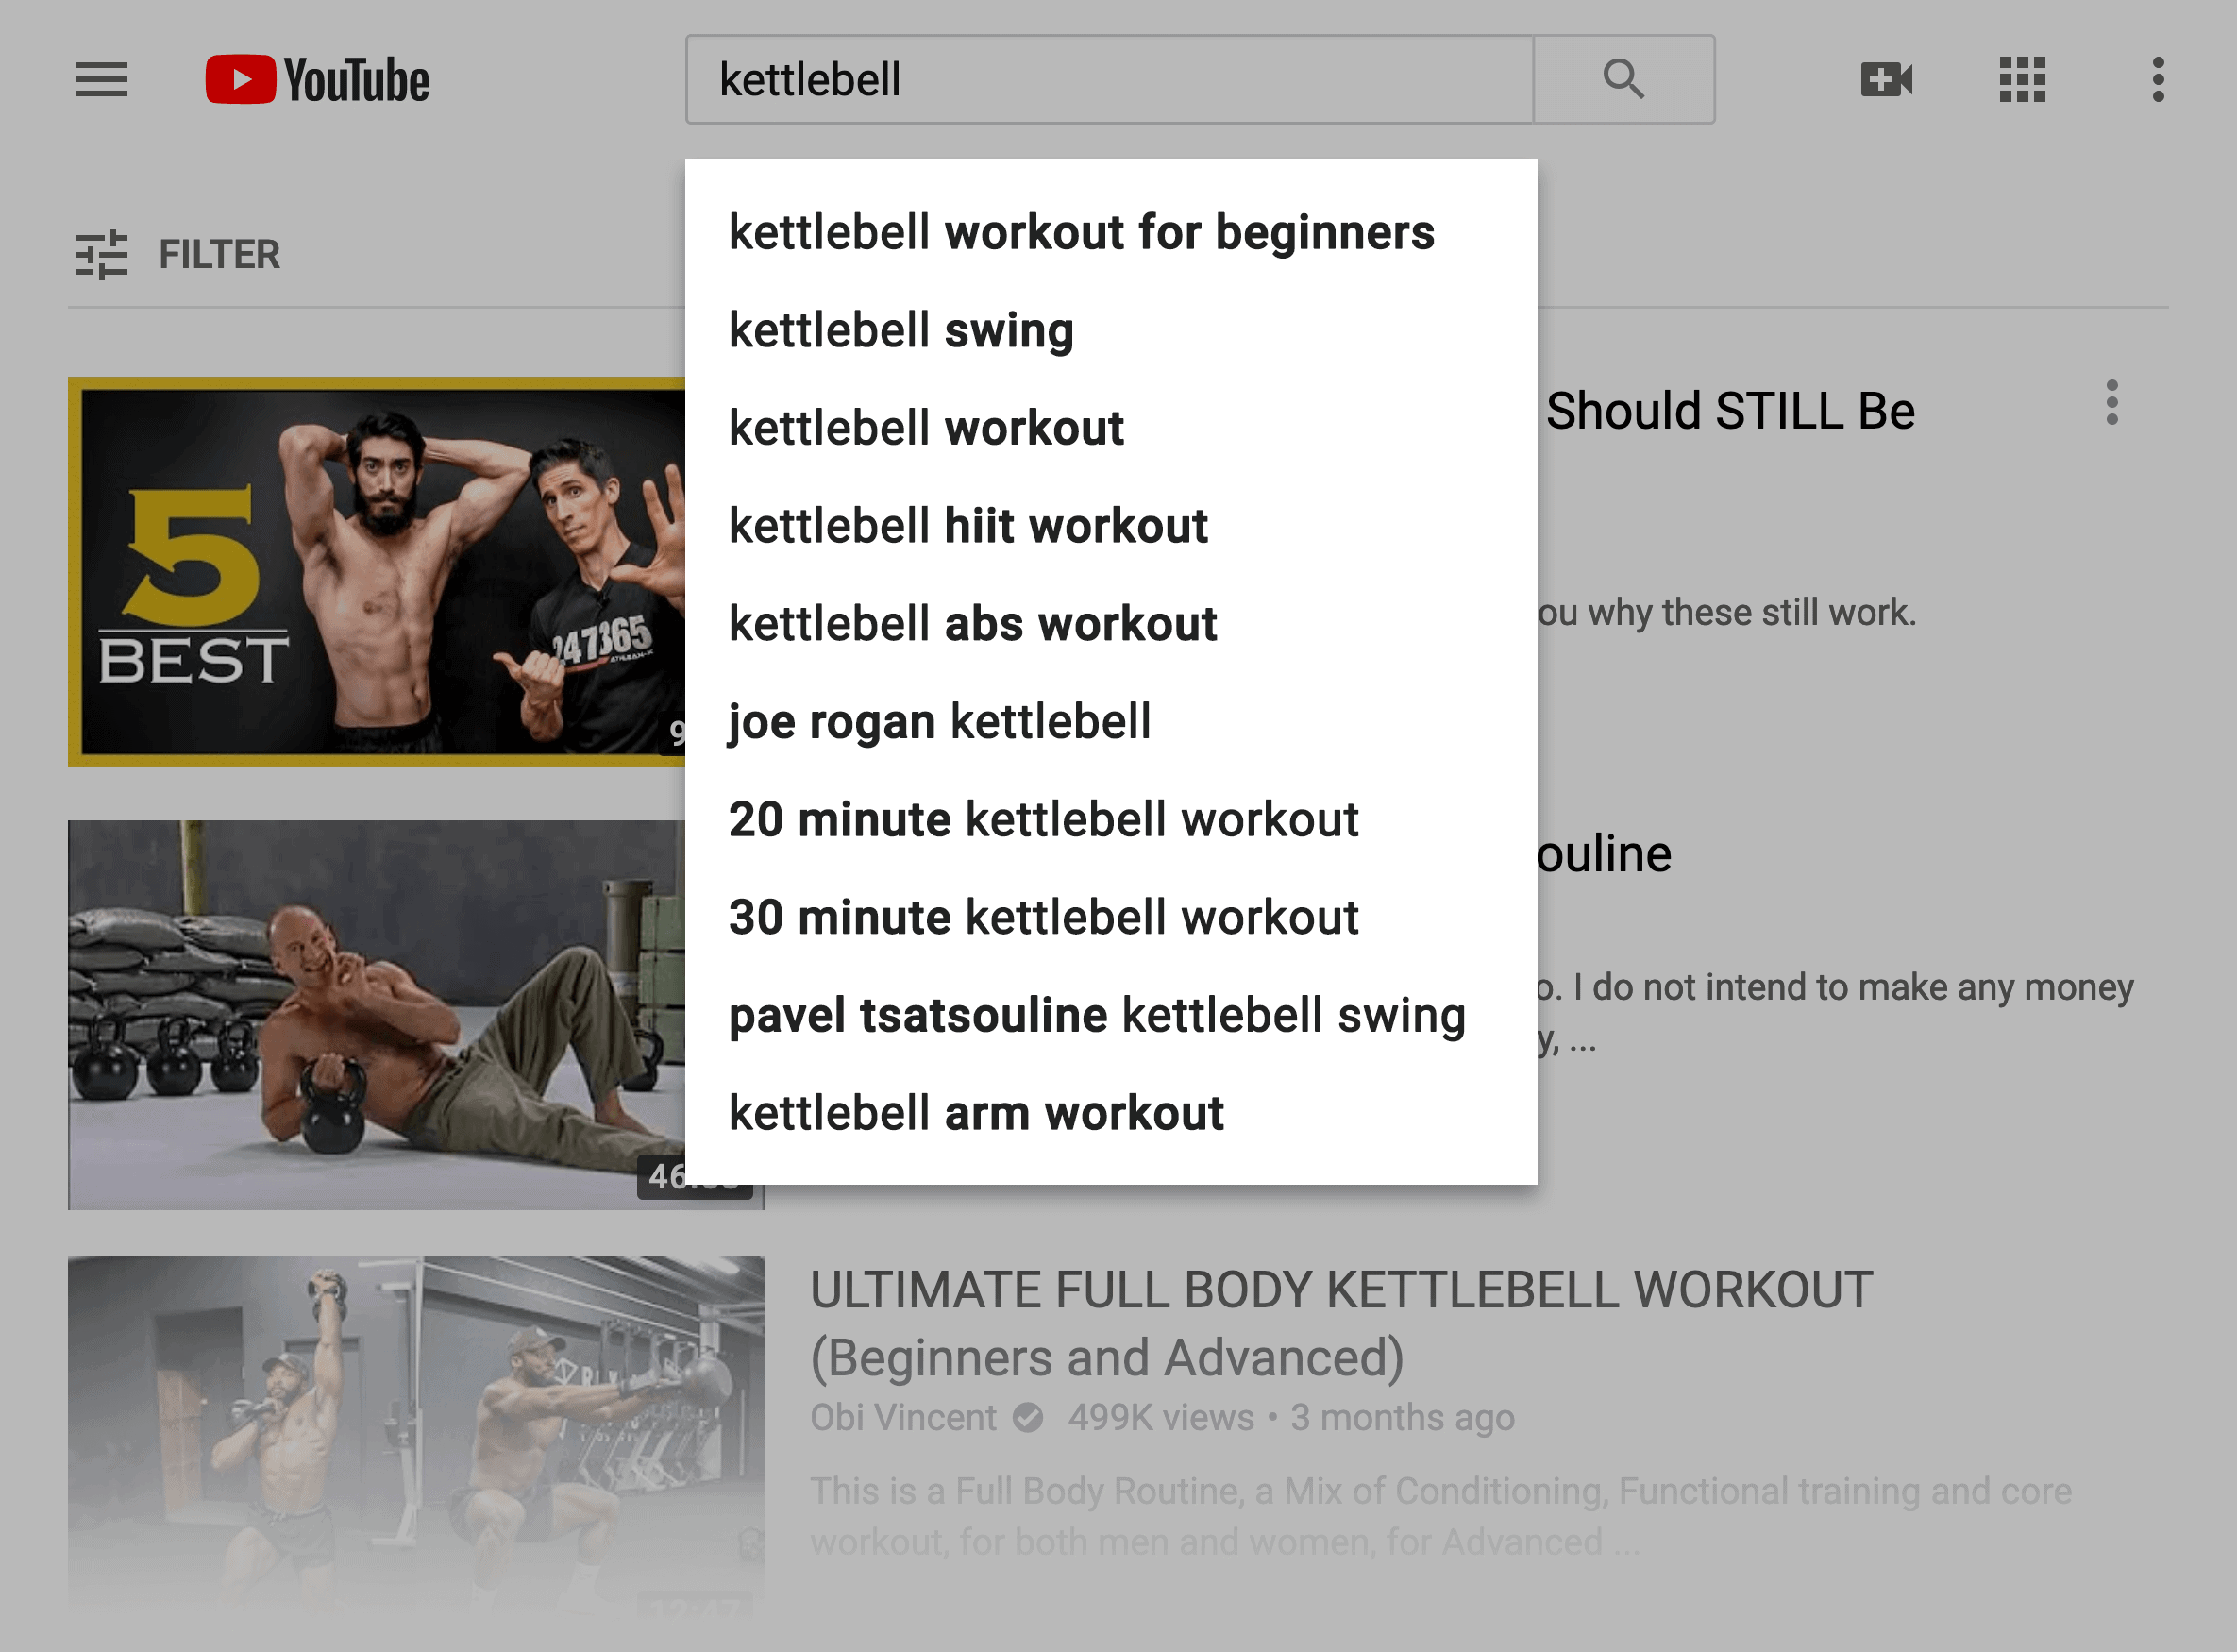 YouTube suggests – Long keywords